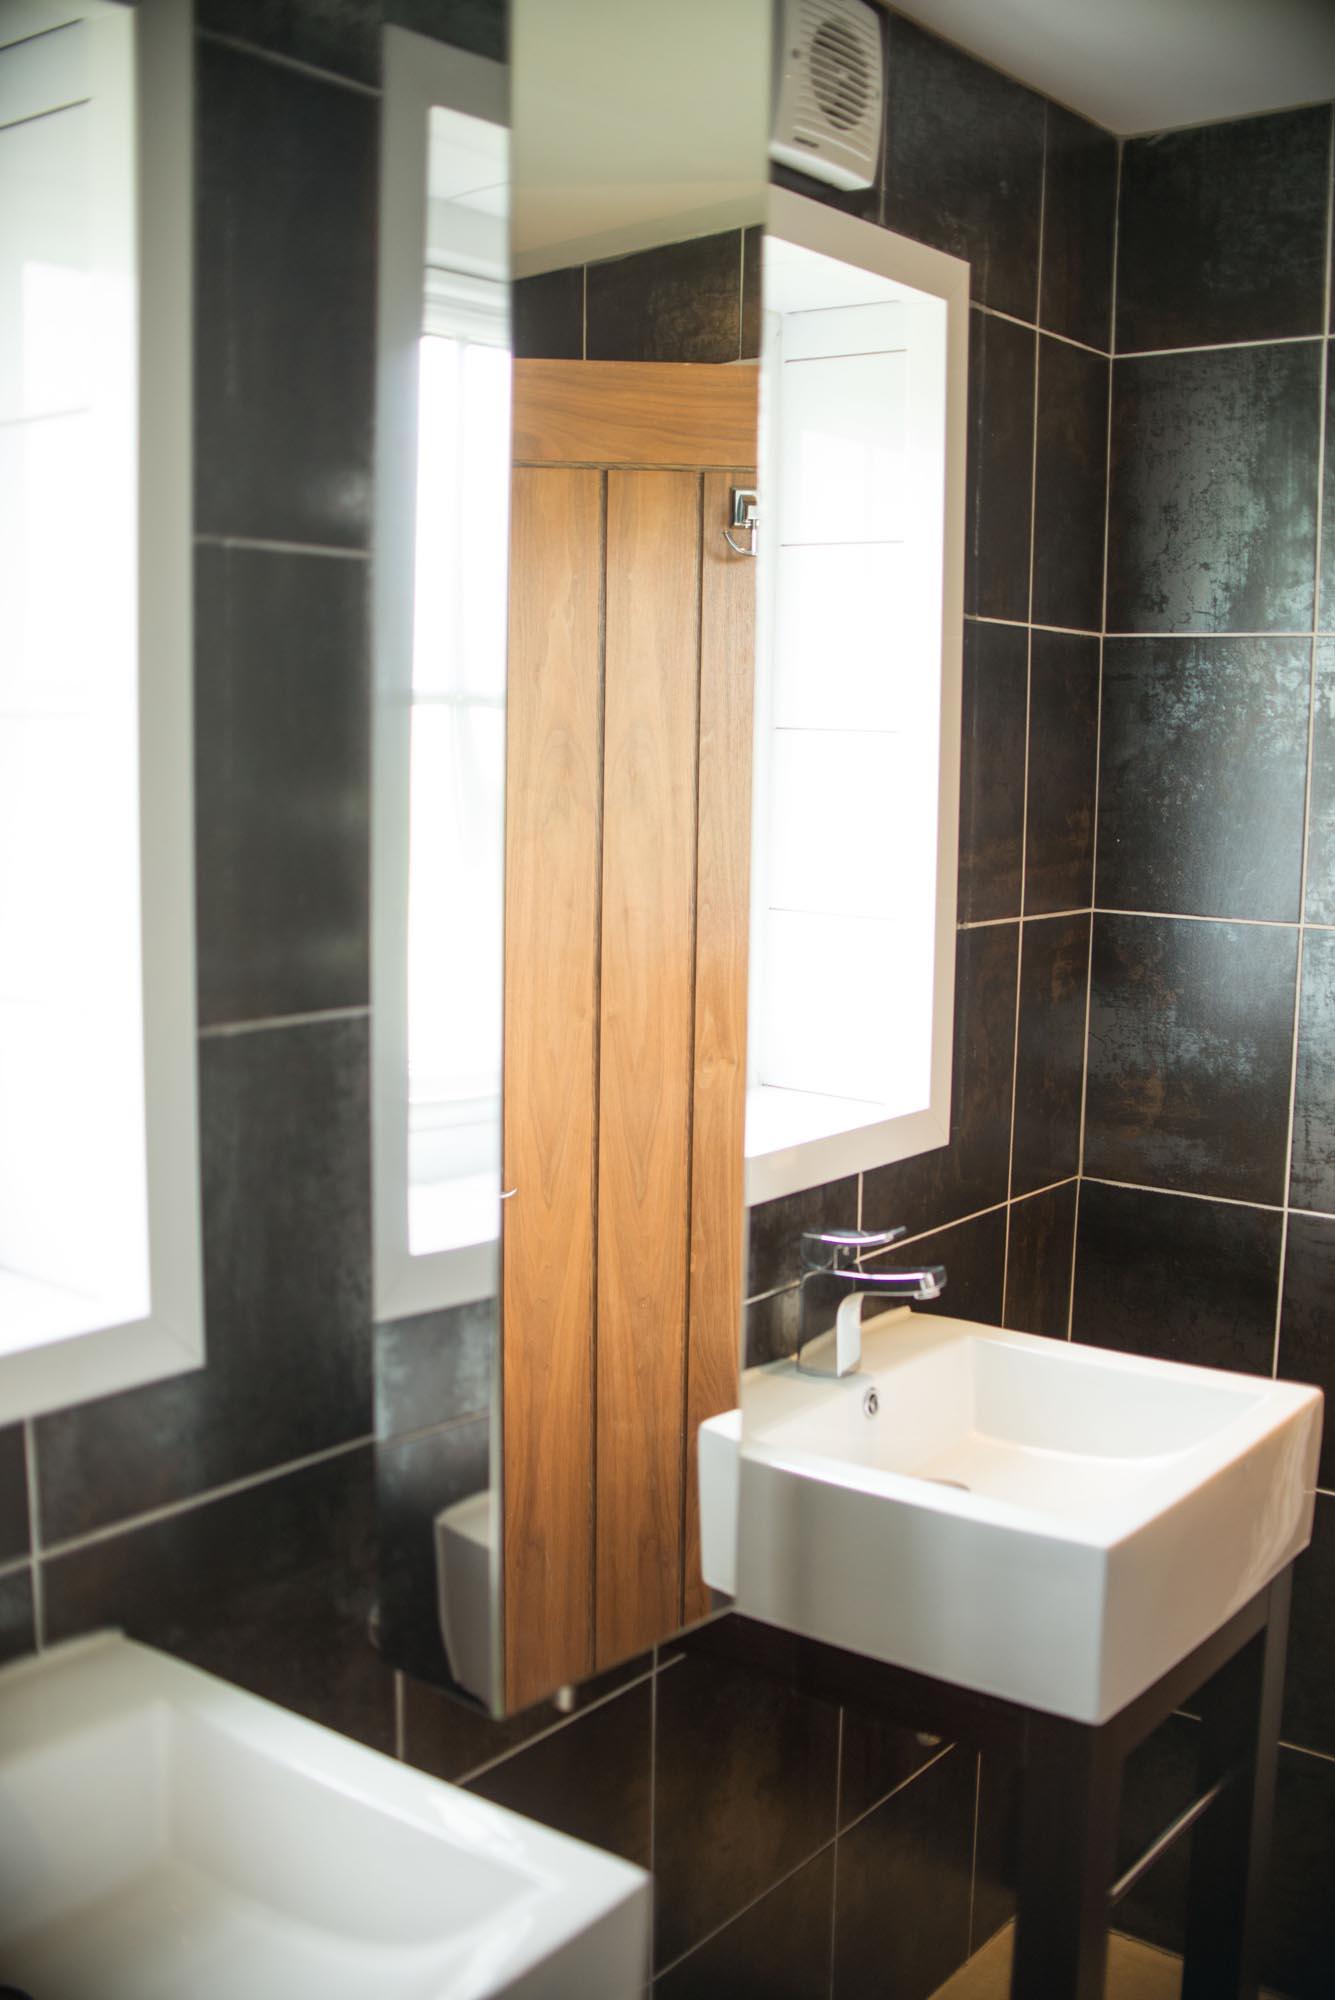 luxury lodges east yorkshire, Hot tub lodge Yorkshire, Lodge Park East Yorkshire